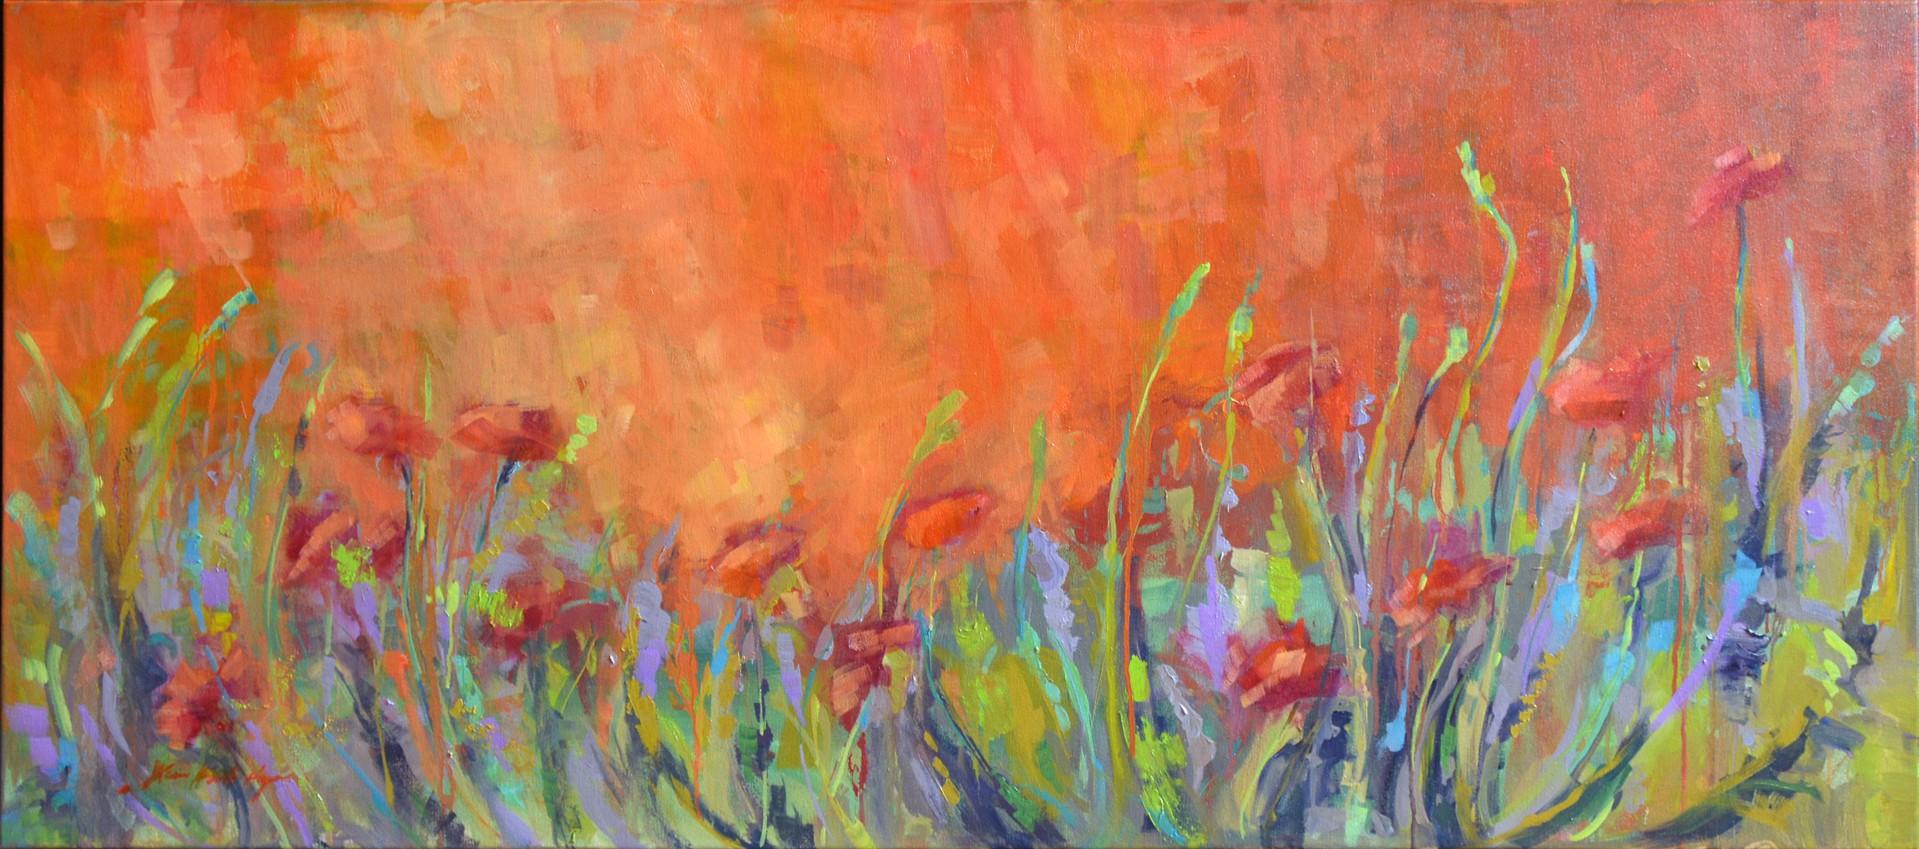 Forever Poppies by Karen Hewitt Hagan